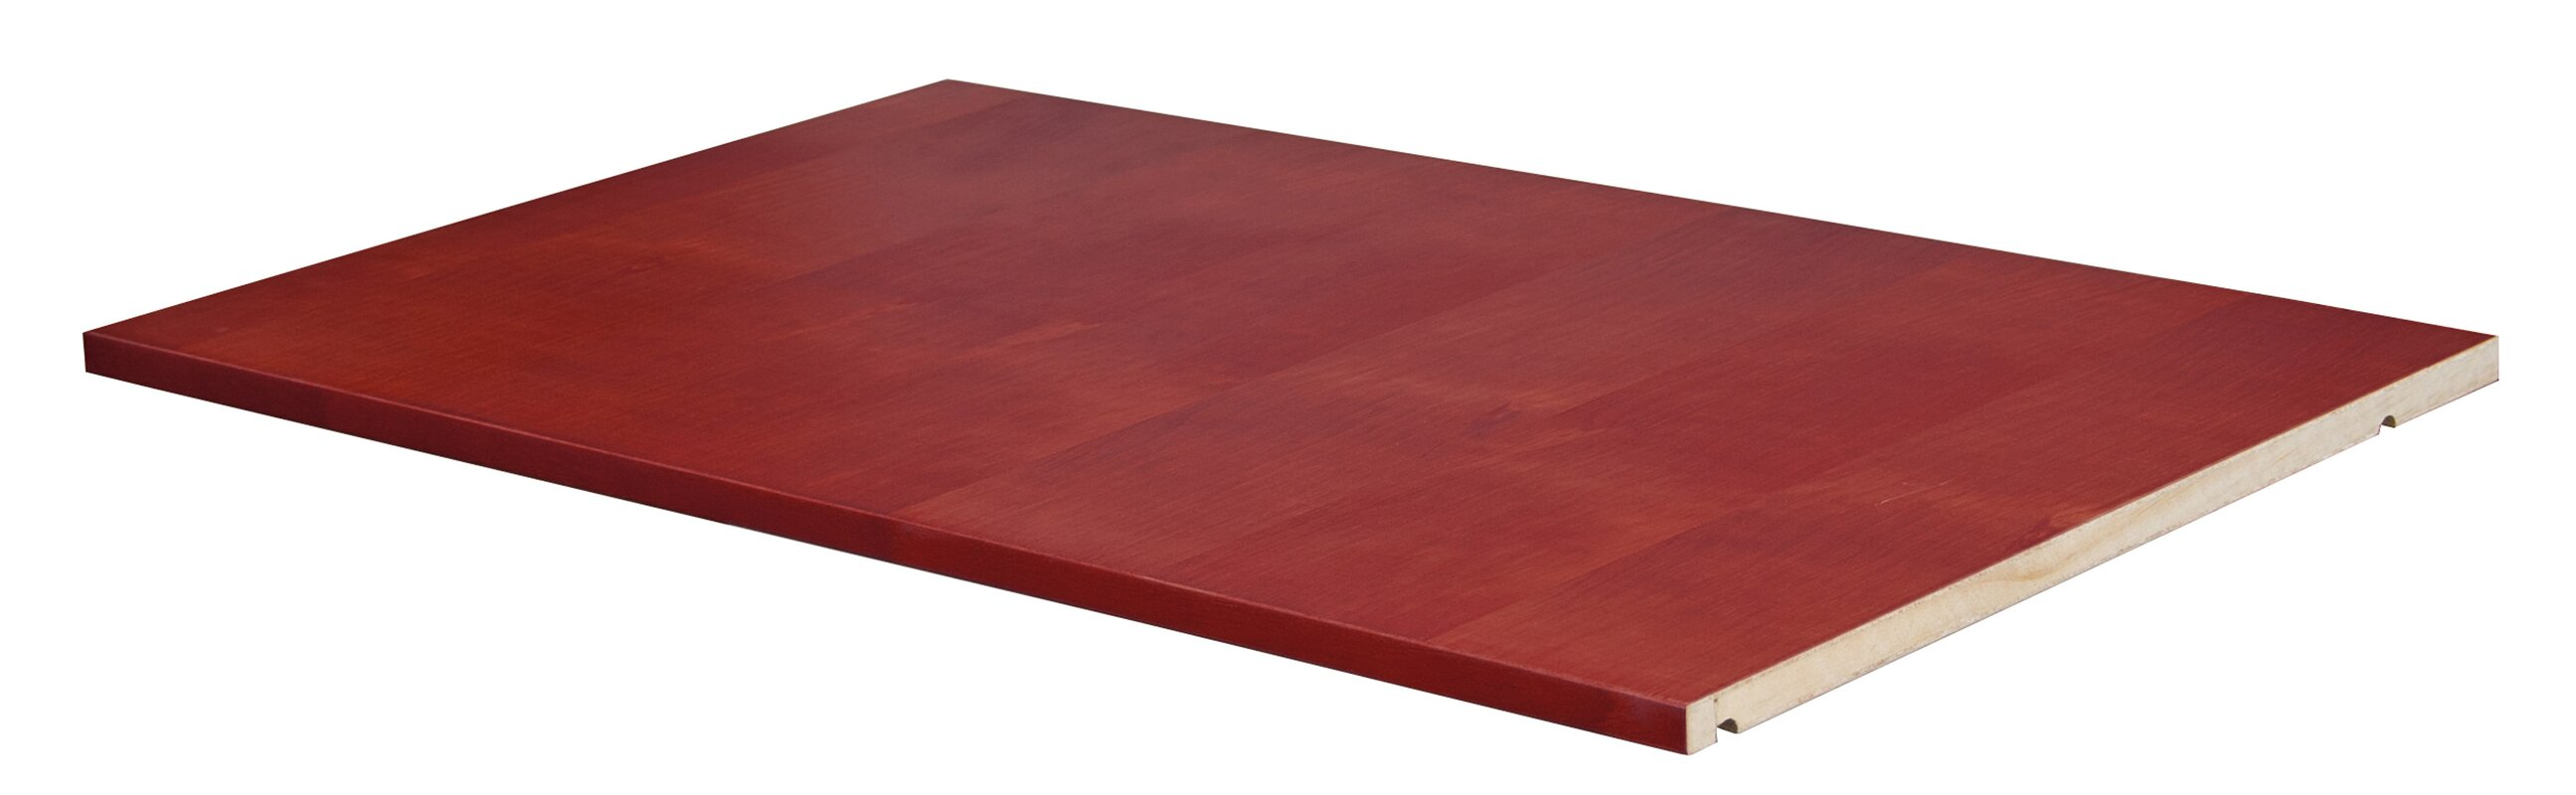 grand flexible petite armoire shelf divider reviews. Black Bedroom Furniture Sets. Home Design Ideas